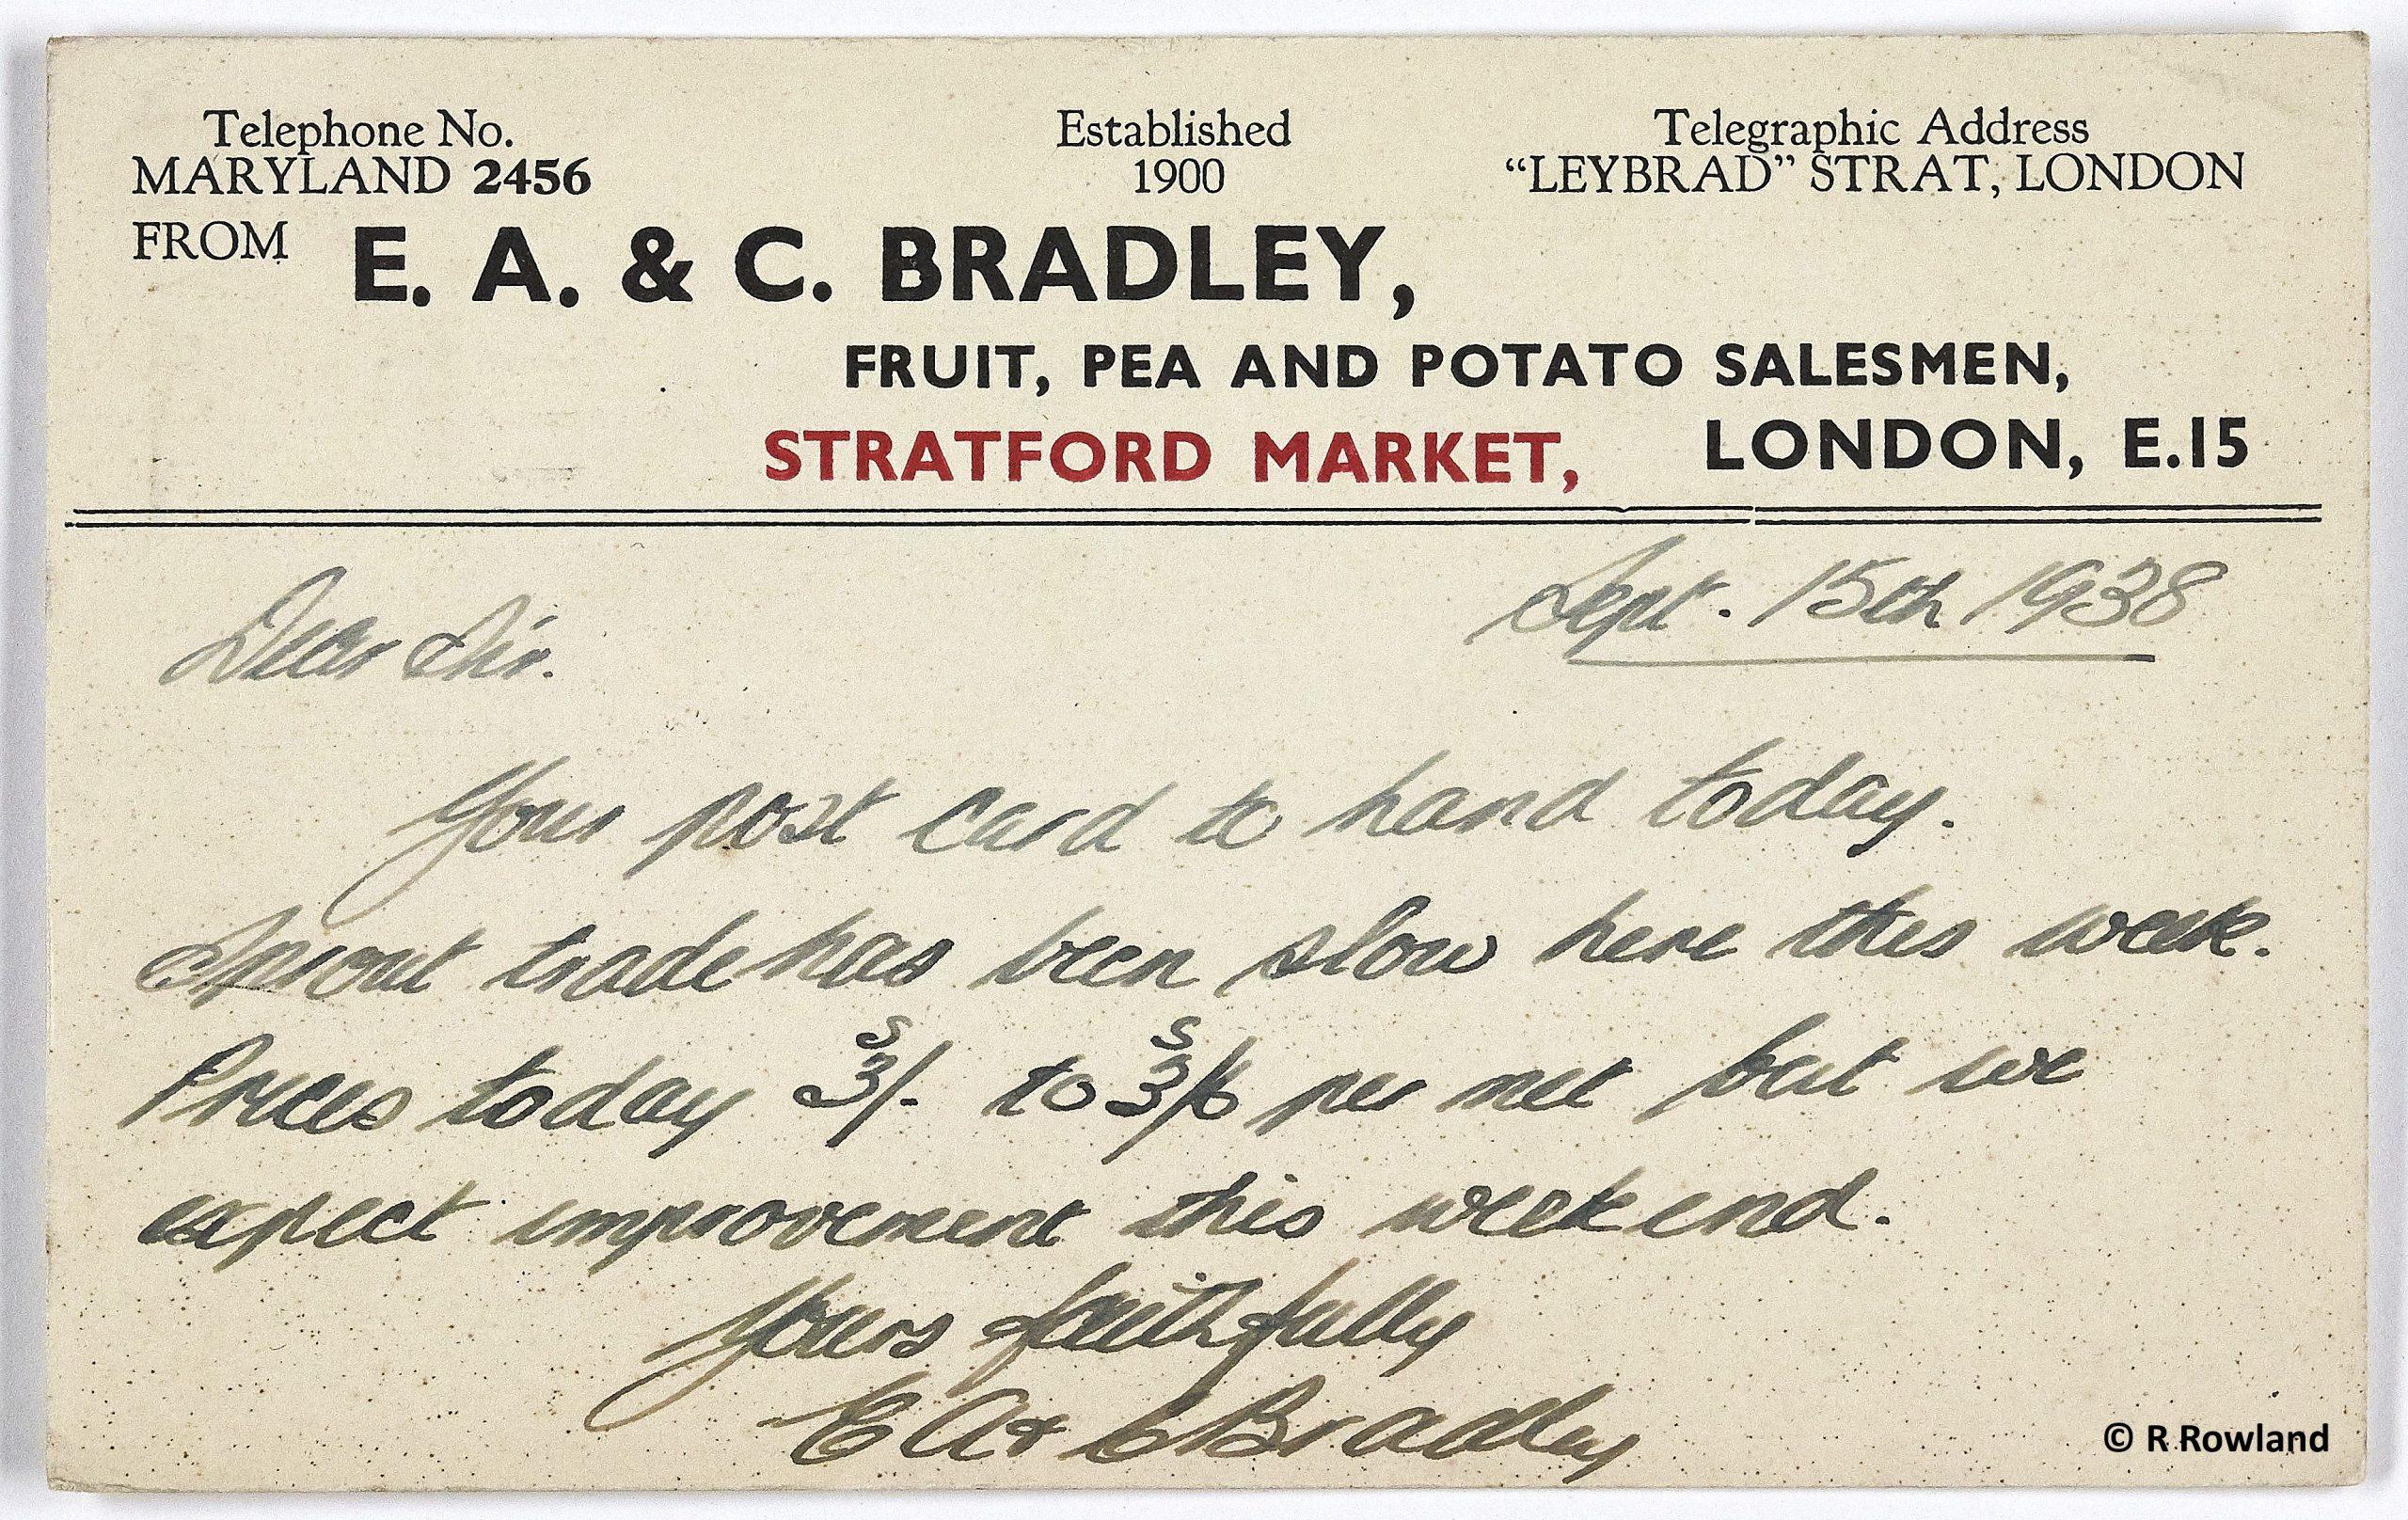 Postcard order 1938